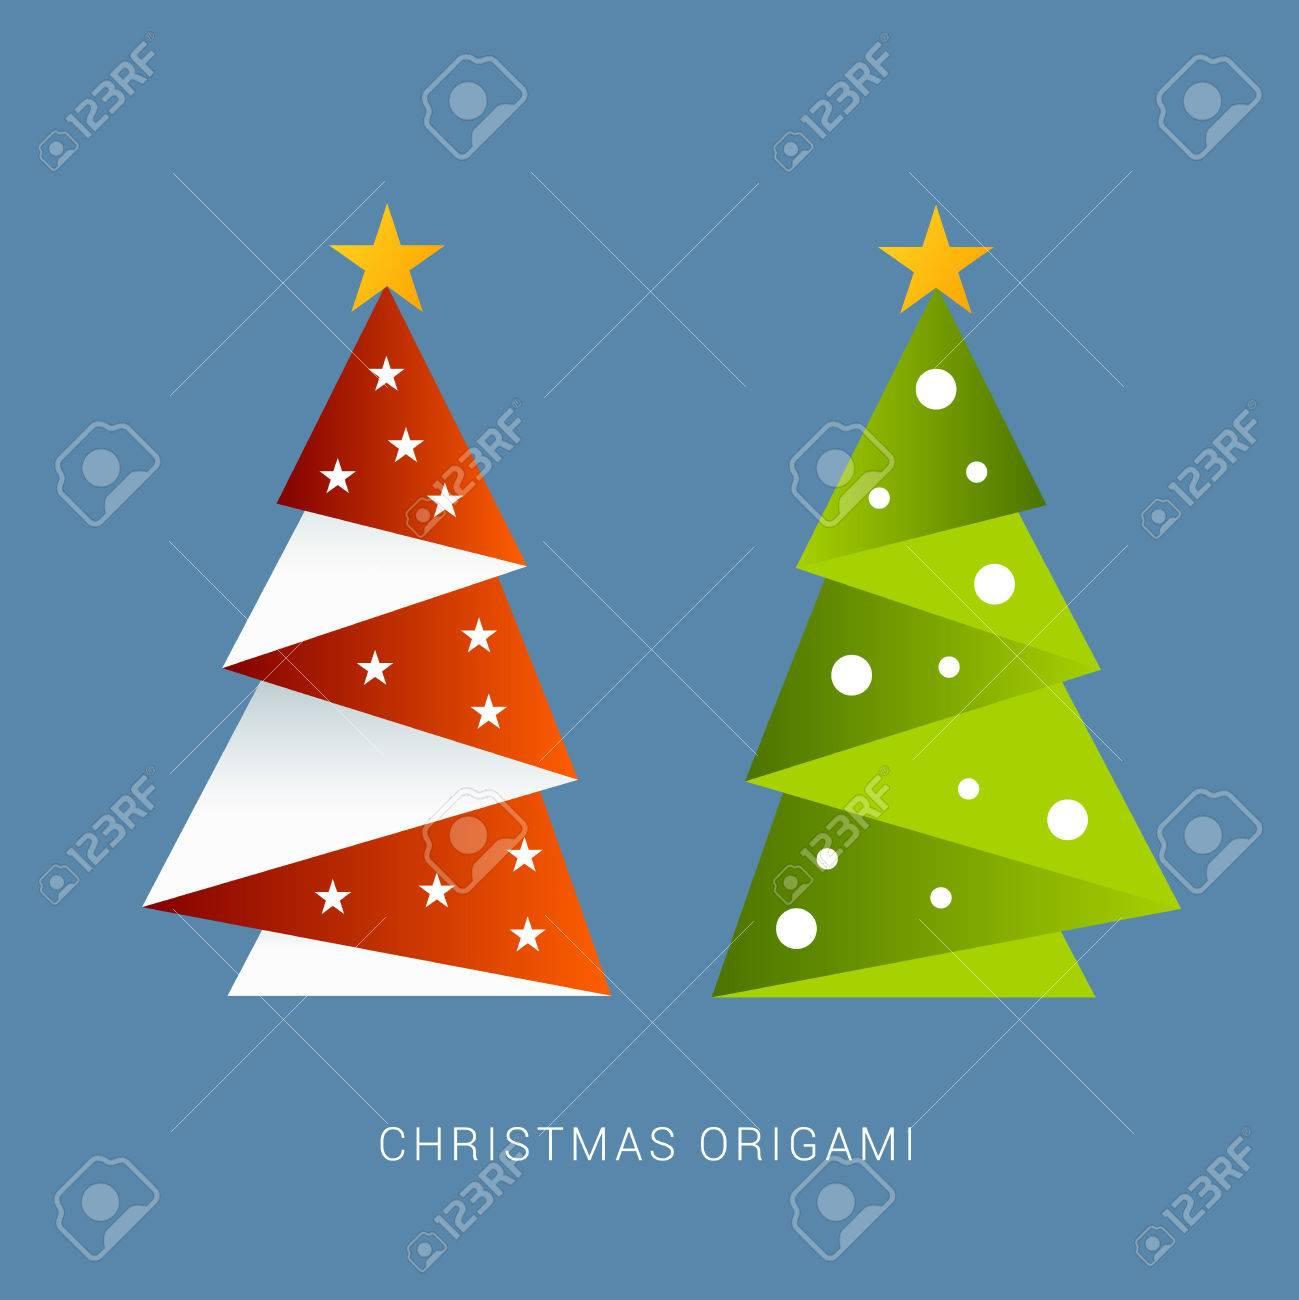 Weihnachtskarten Origami.Stock Photo